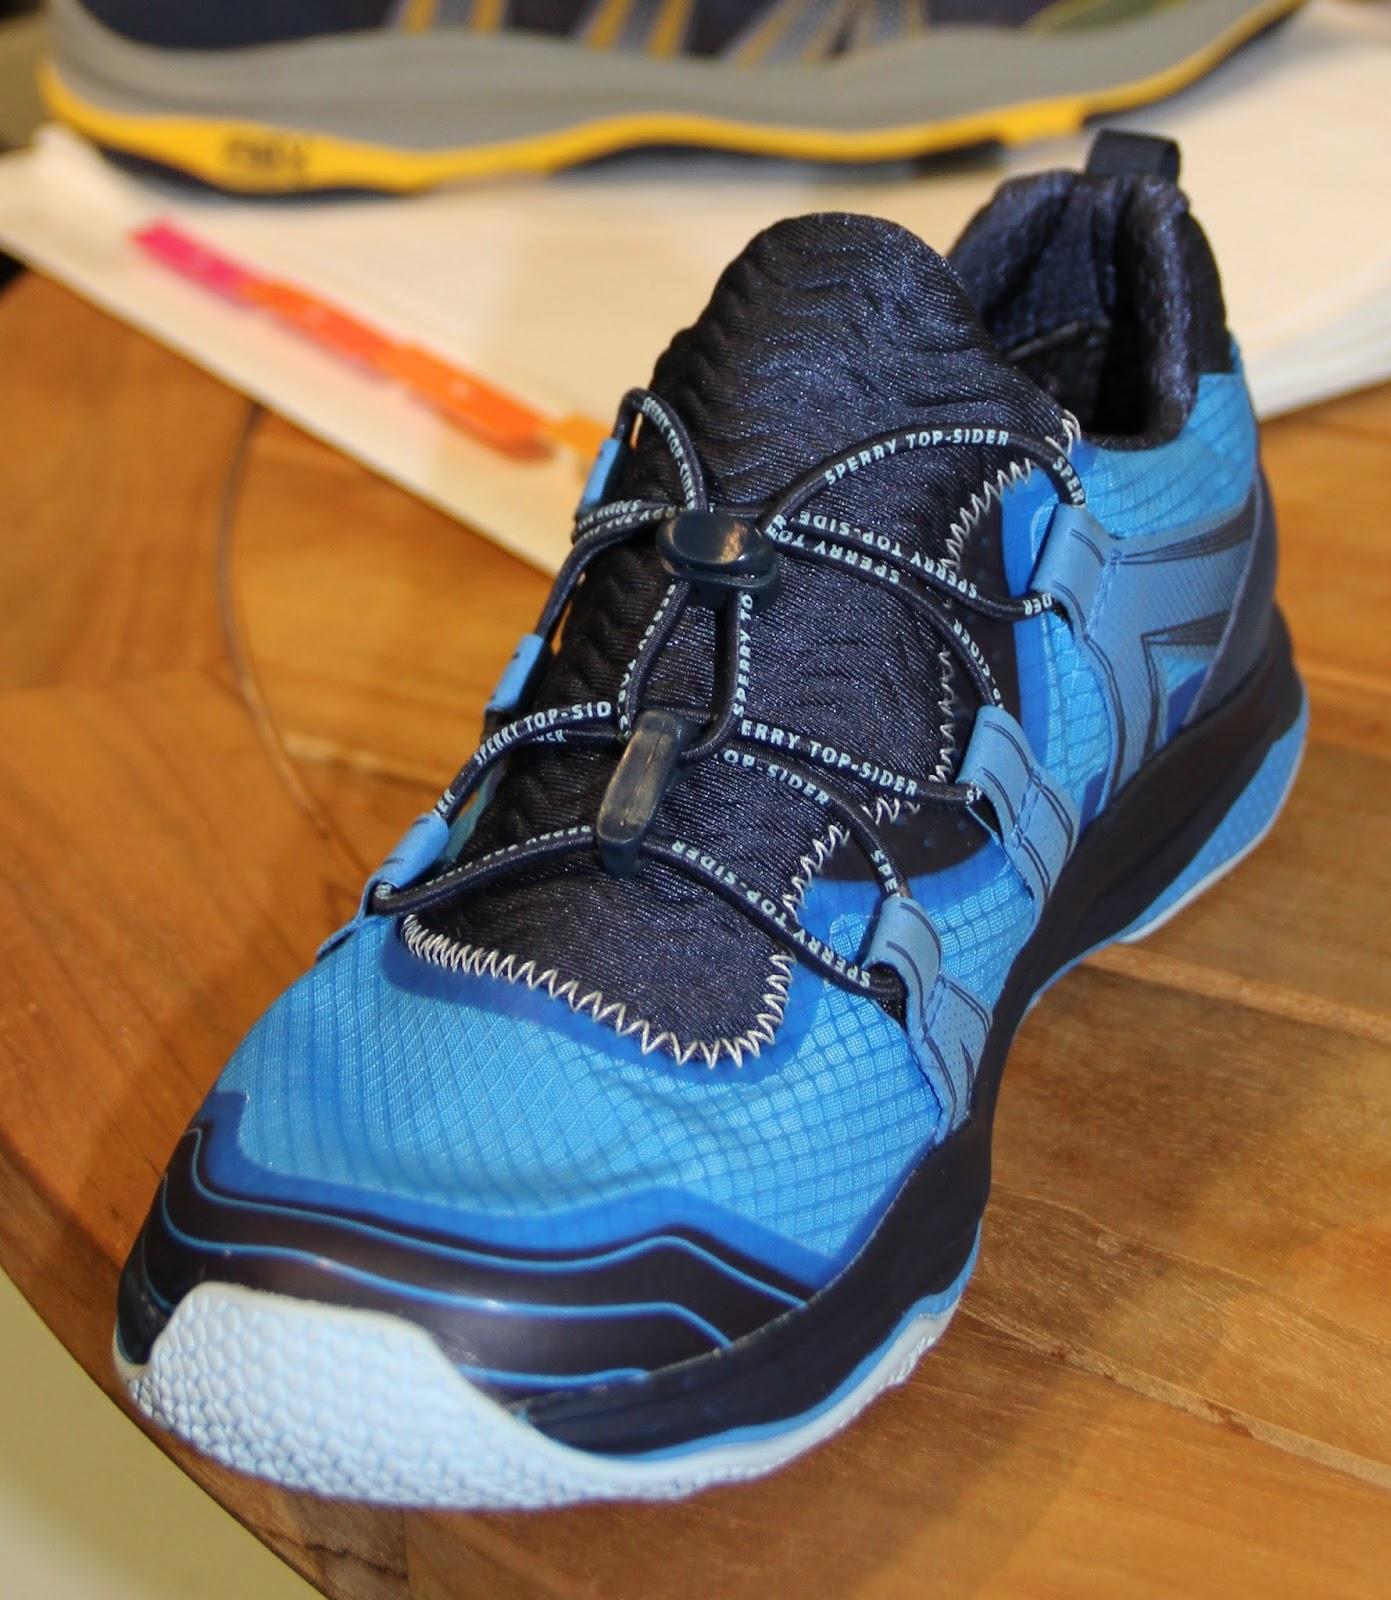 Sperry Top Sider Performance Water Outdoor Footwear M W